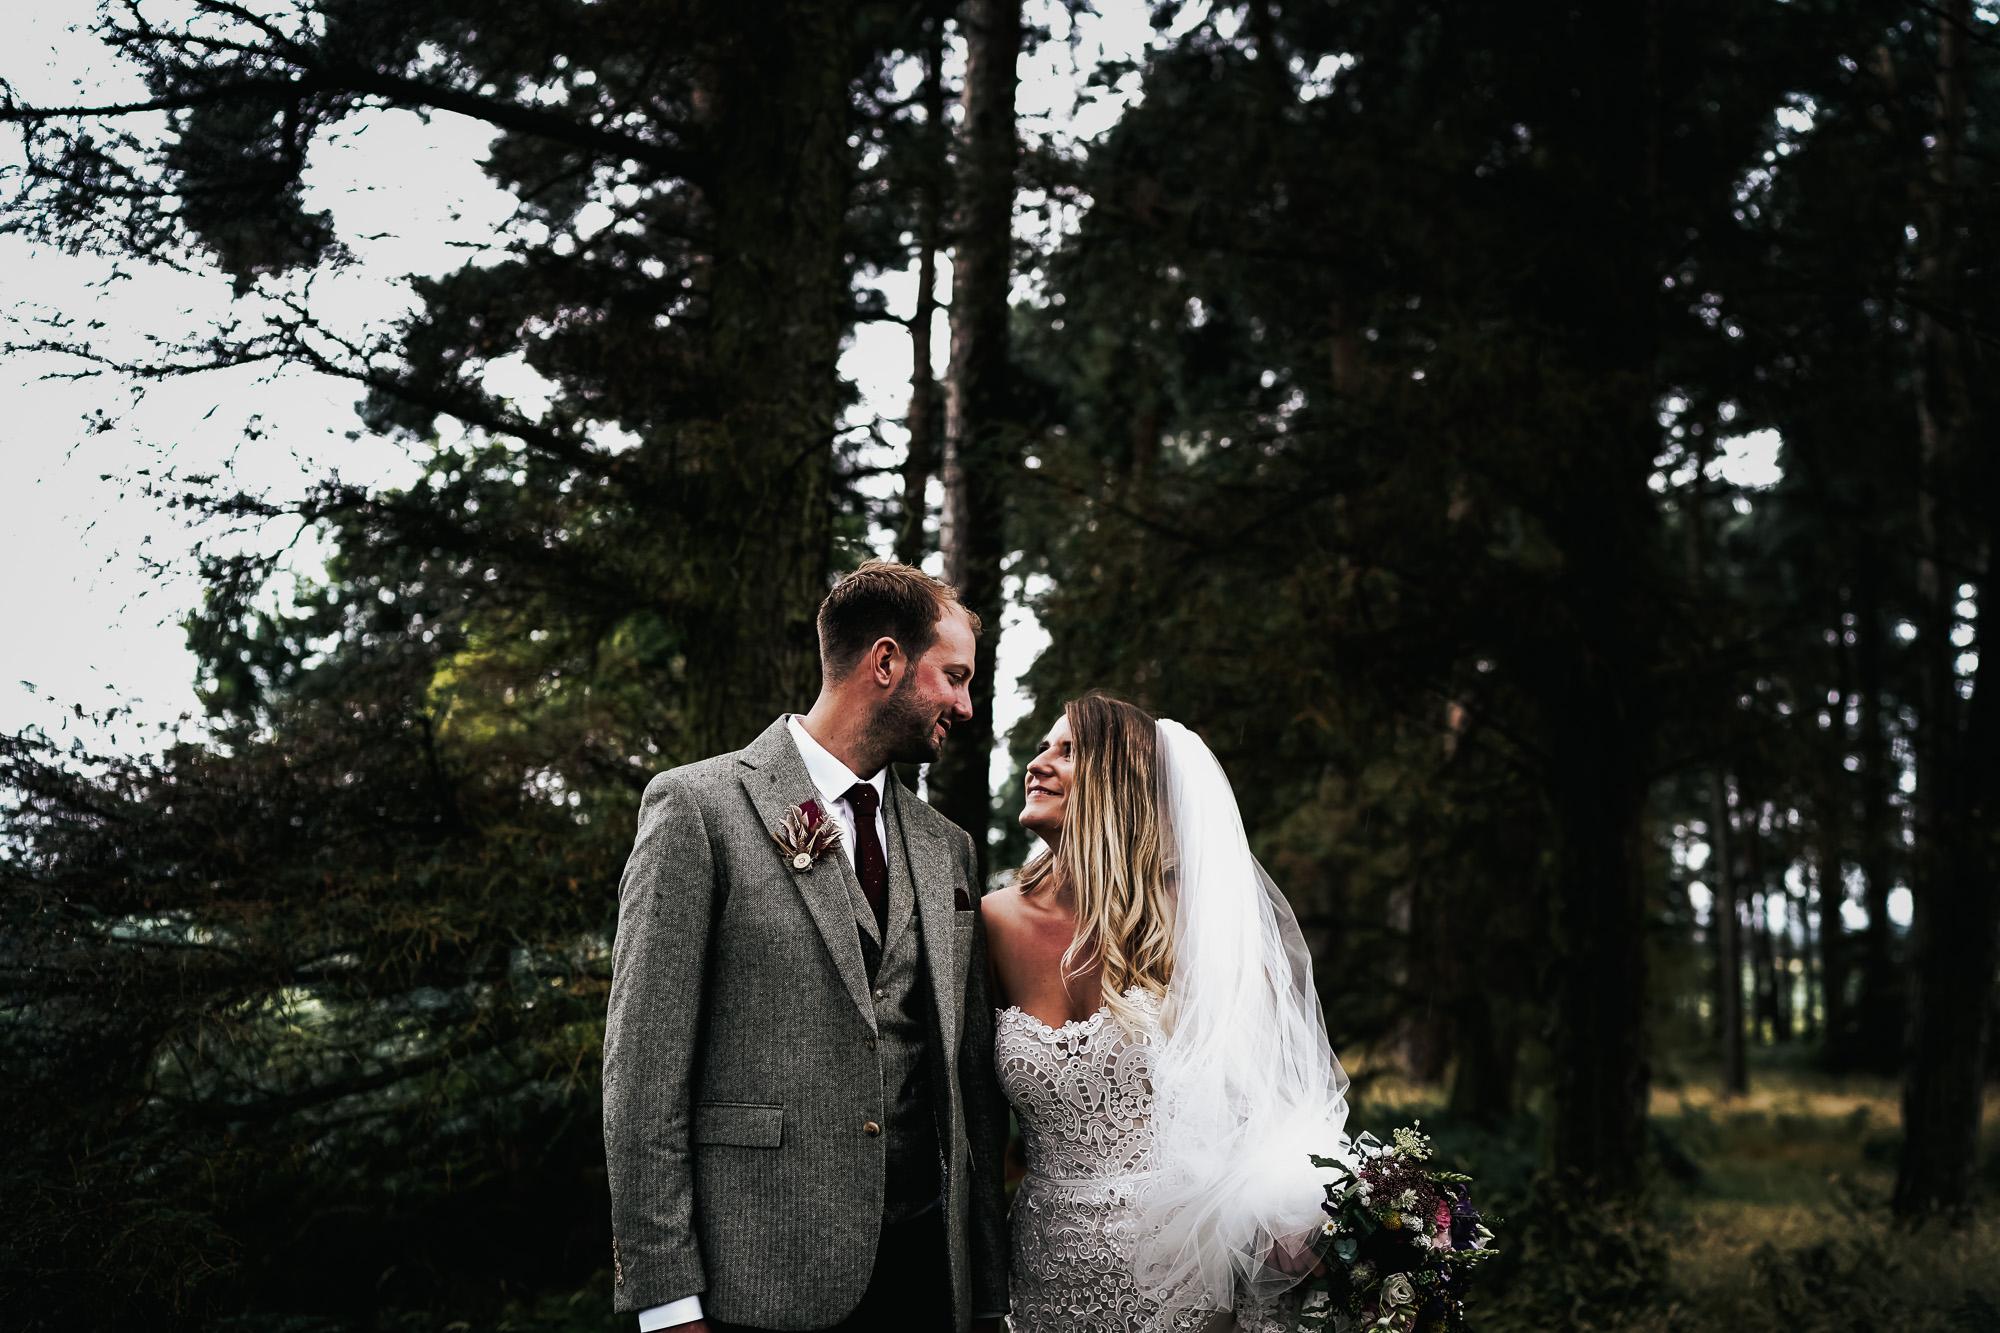 High Barn Wedding photographer lake distect penrith documentry wedding photography (36 of 57).jpg